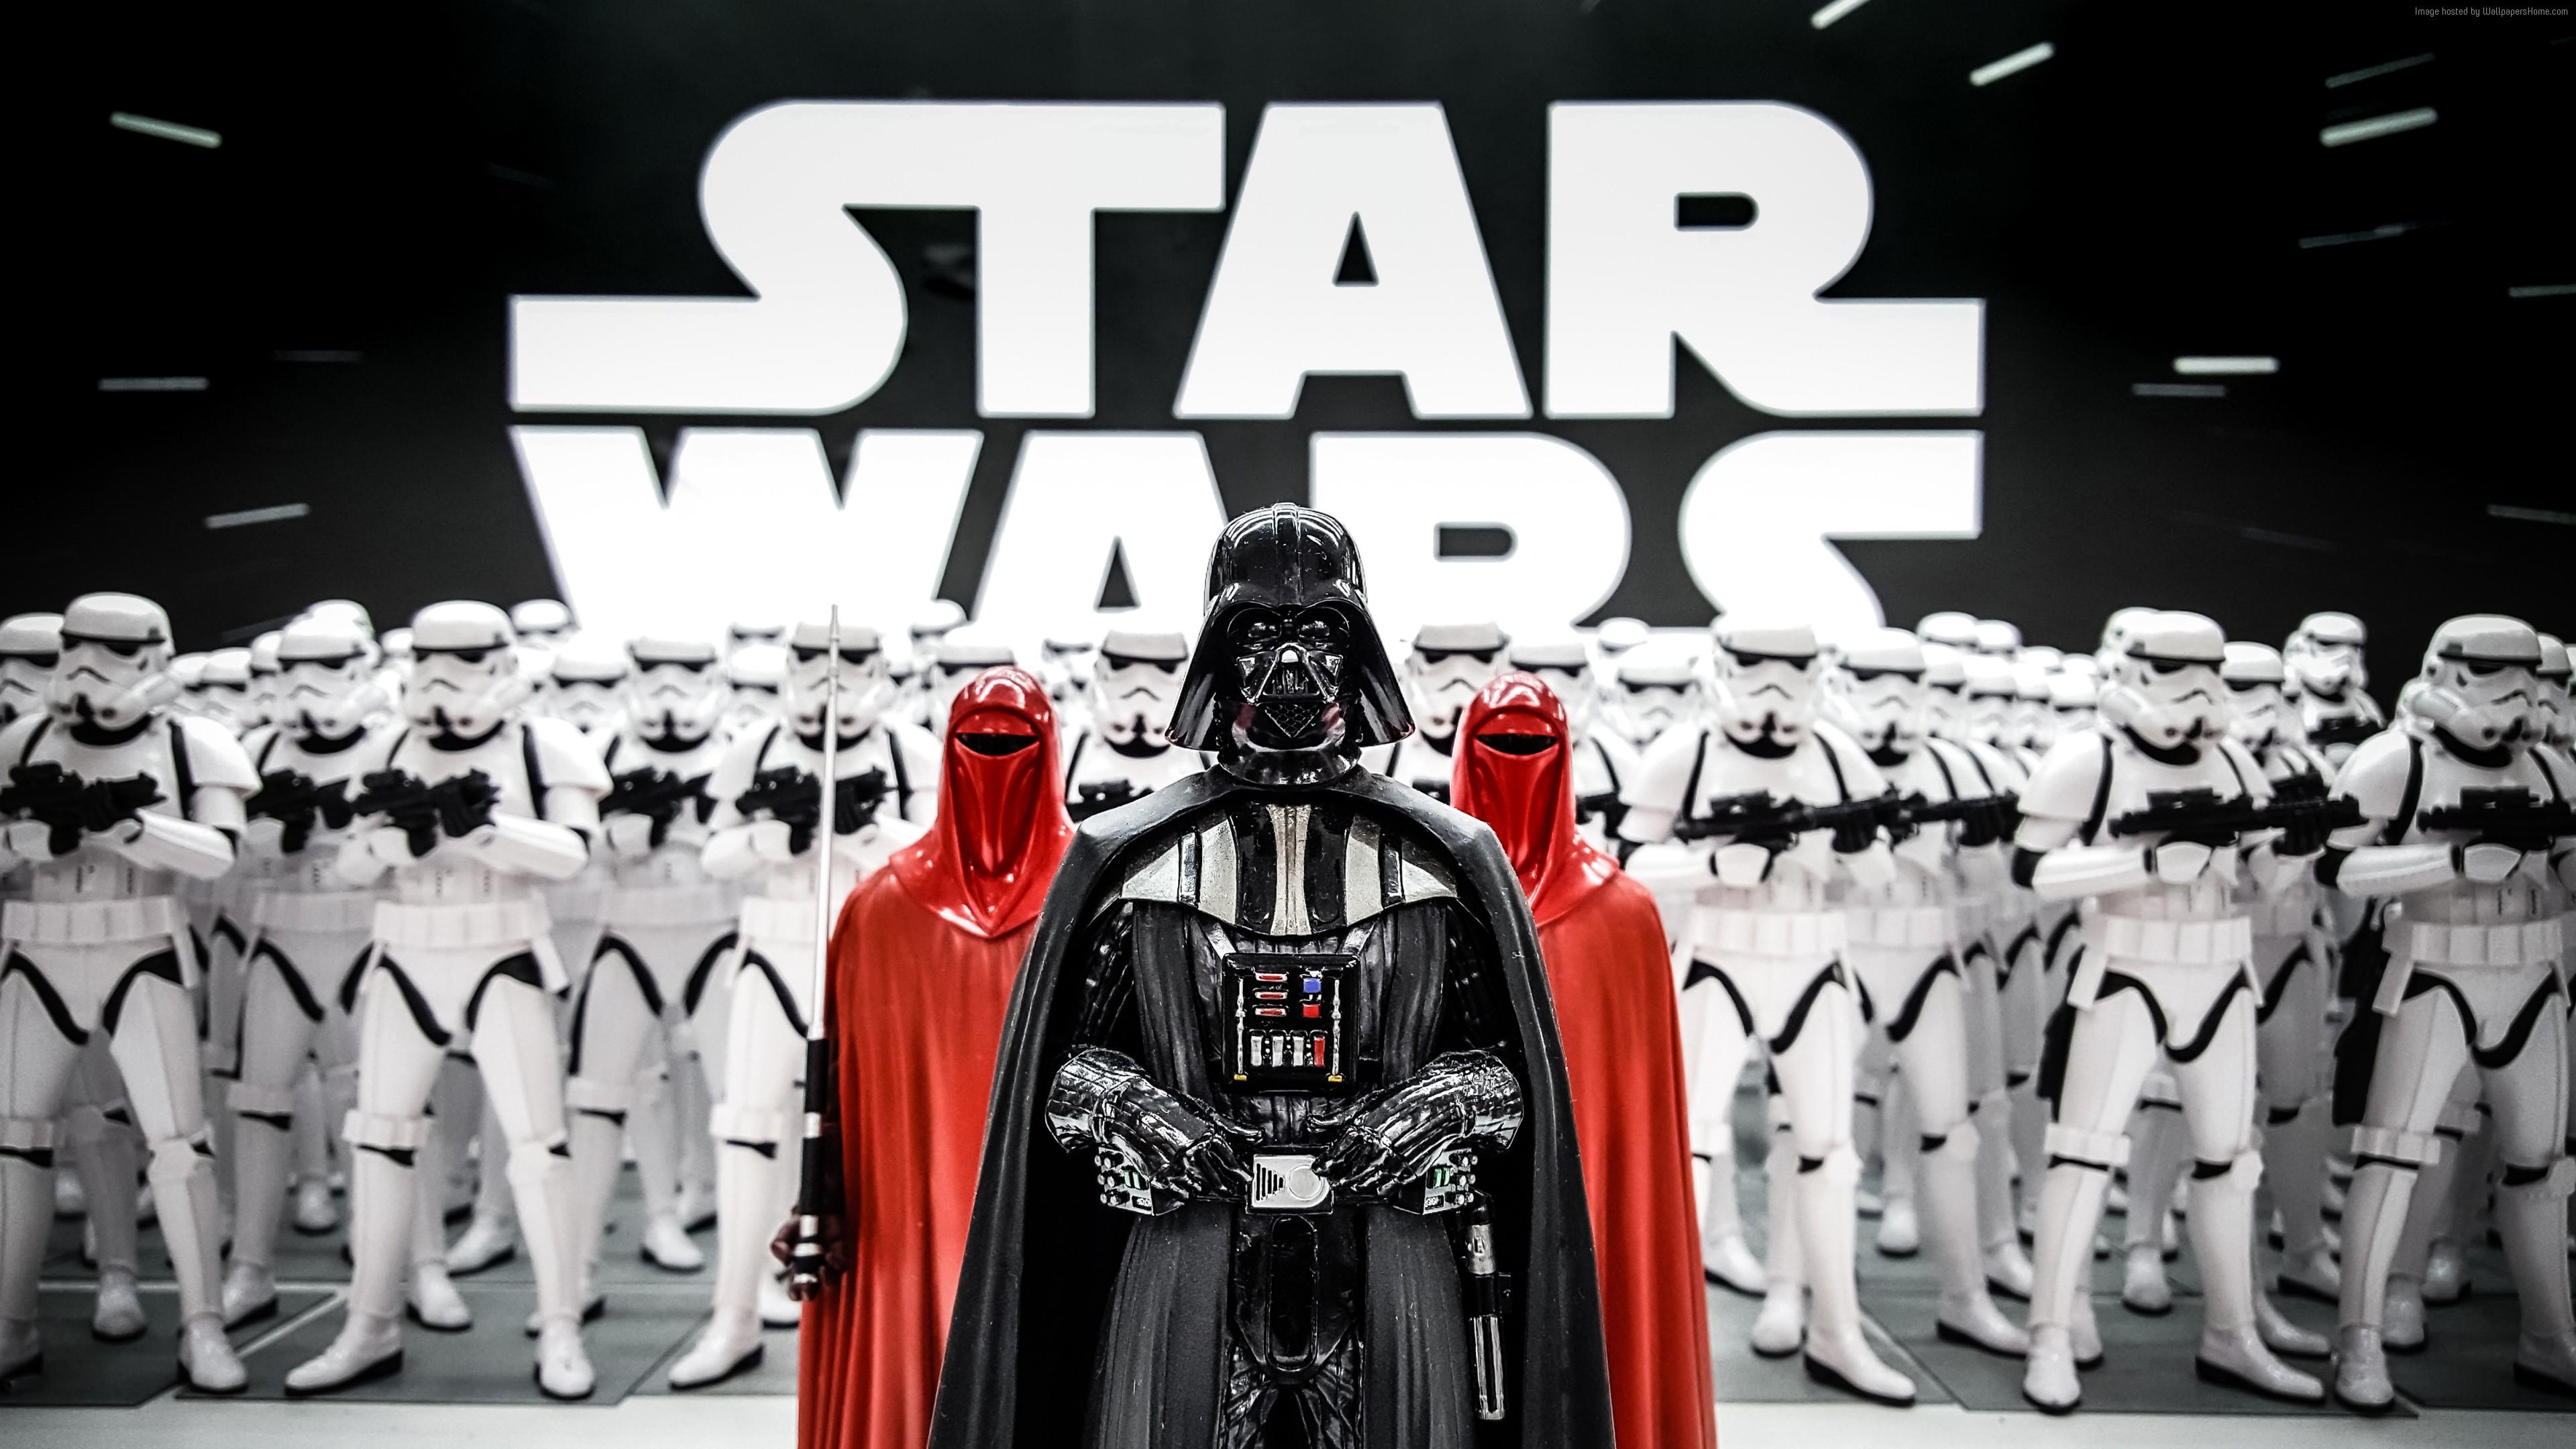 Stock Images Darth Vader Figurine Star Wars Clone Trooper 5K